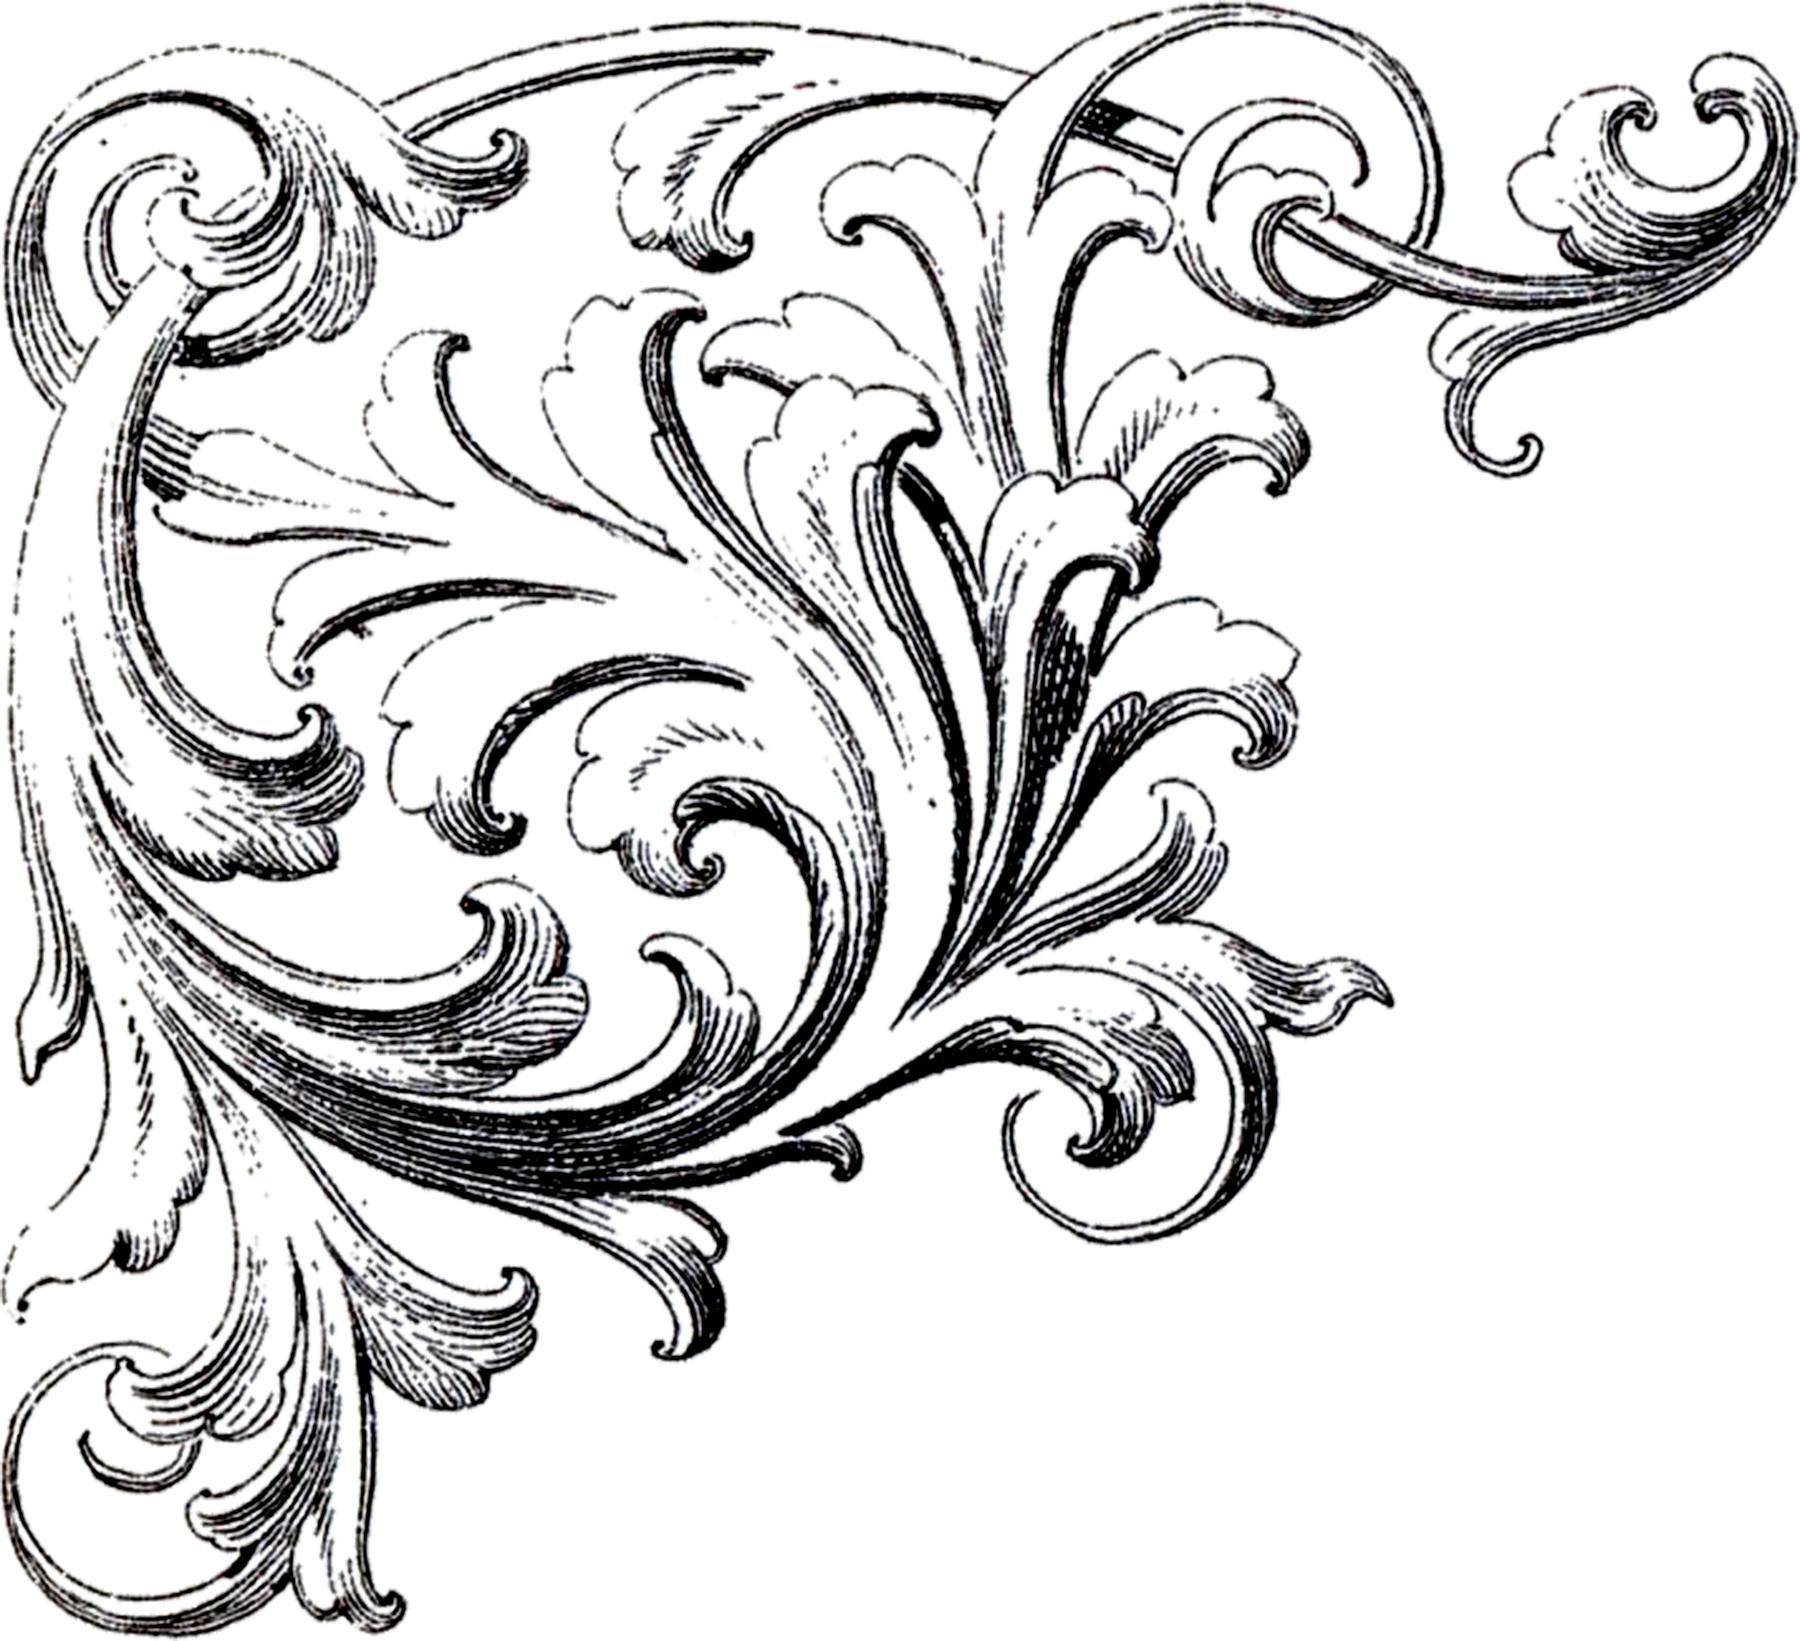 Scrolls Corner Ornament Images - The Graphics Fairy